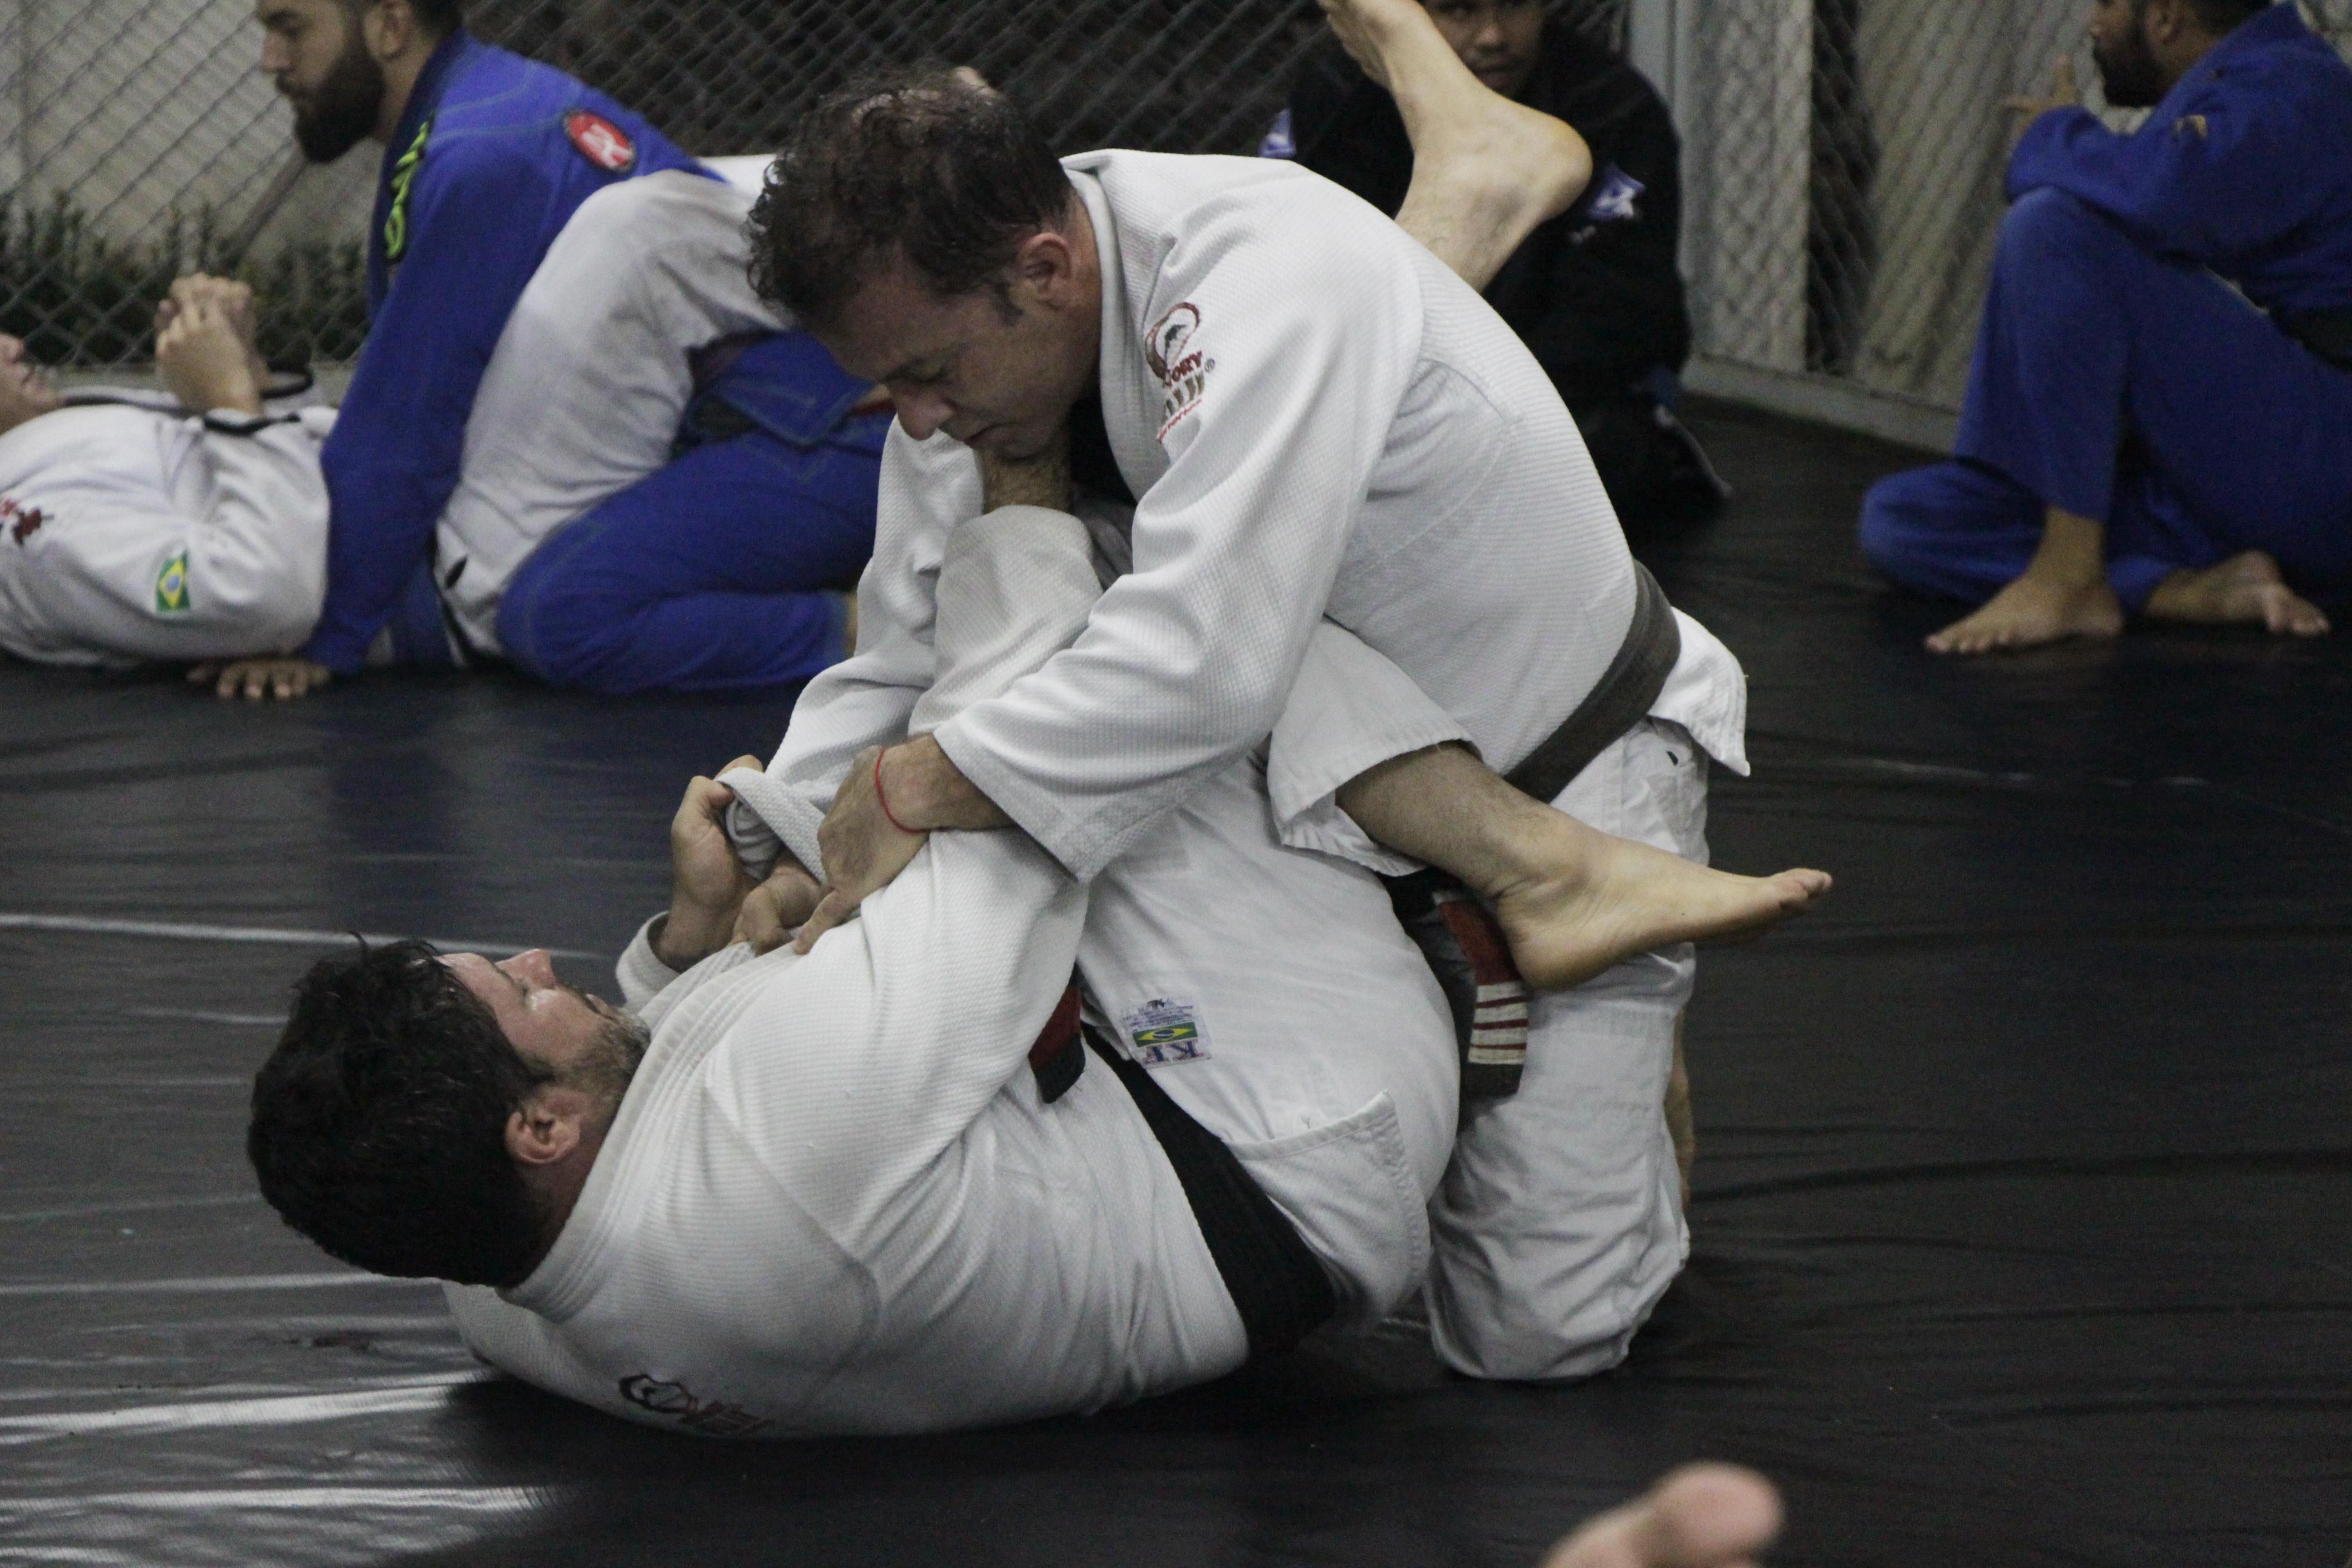 Chico Preto durante treinamento na academia AJ